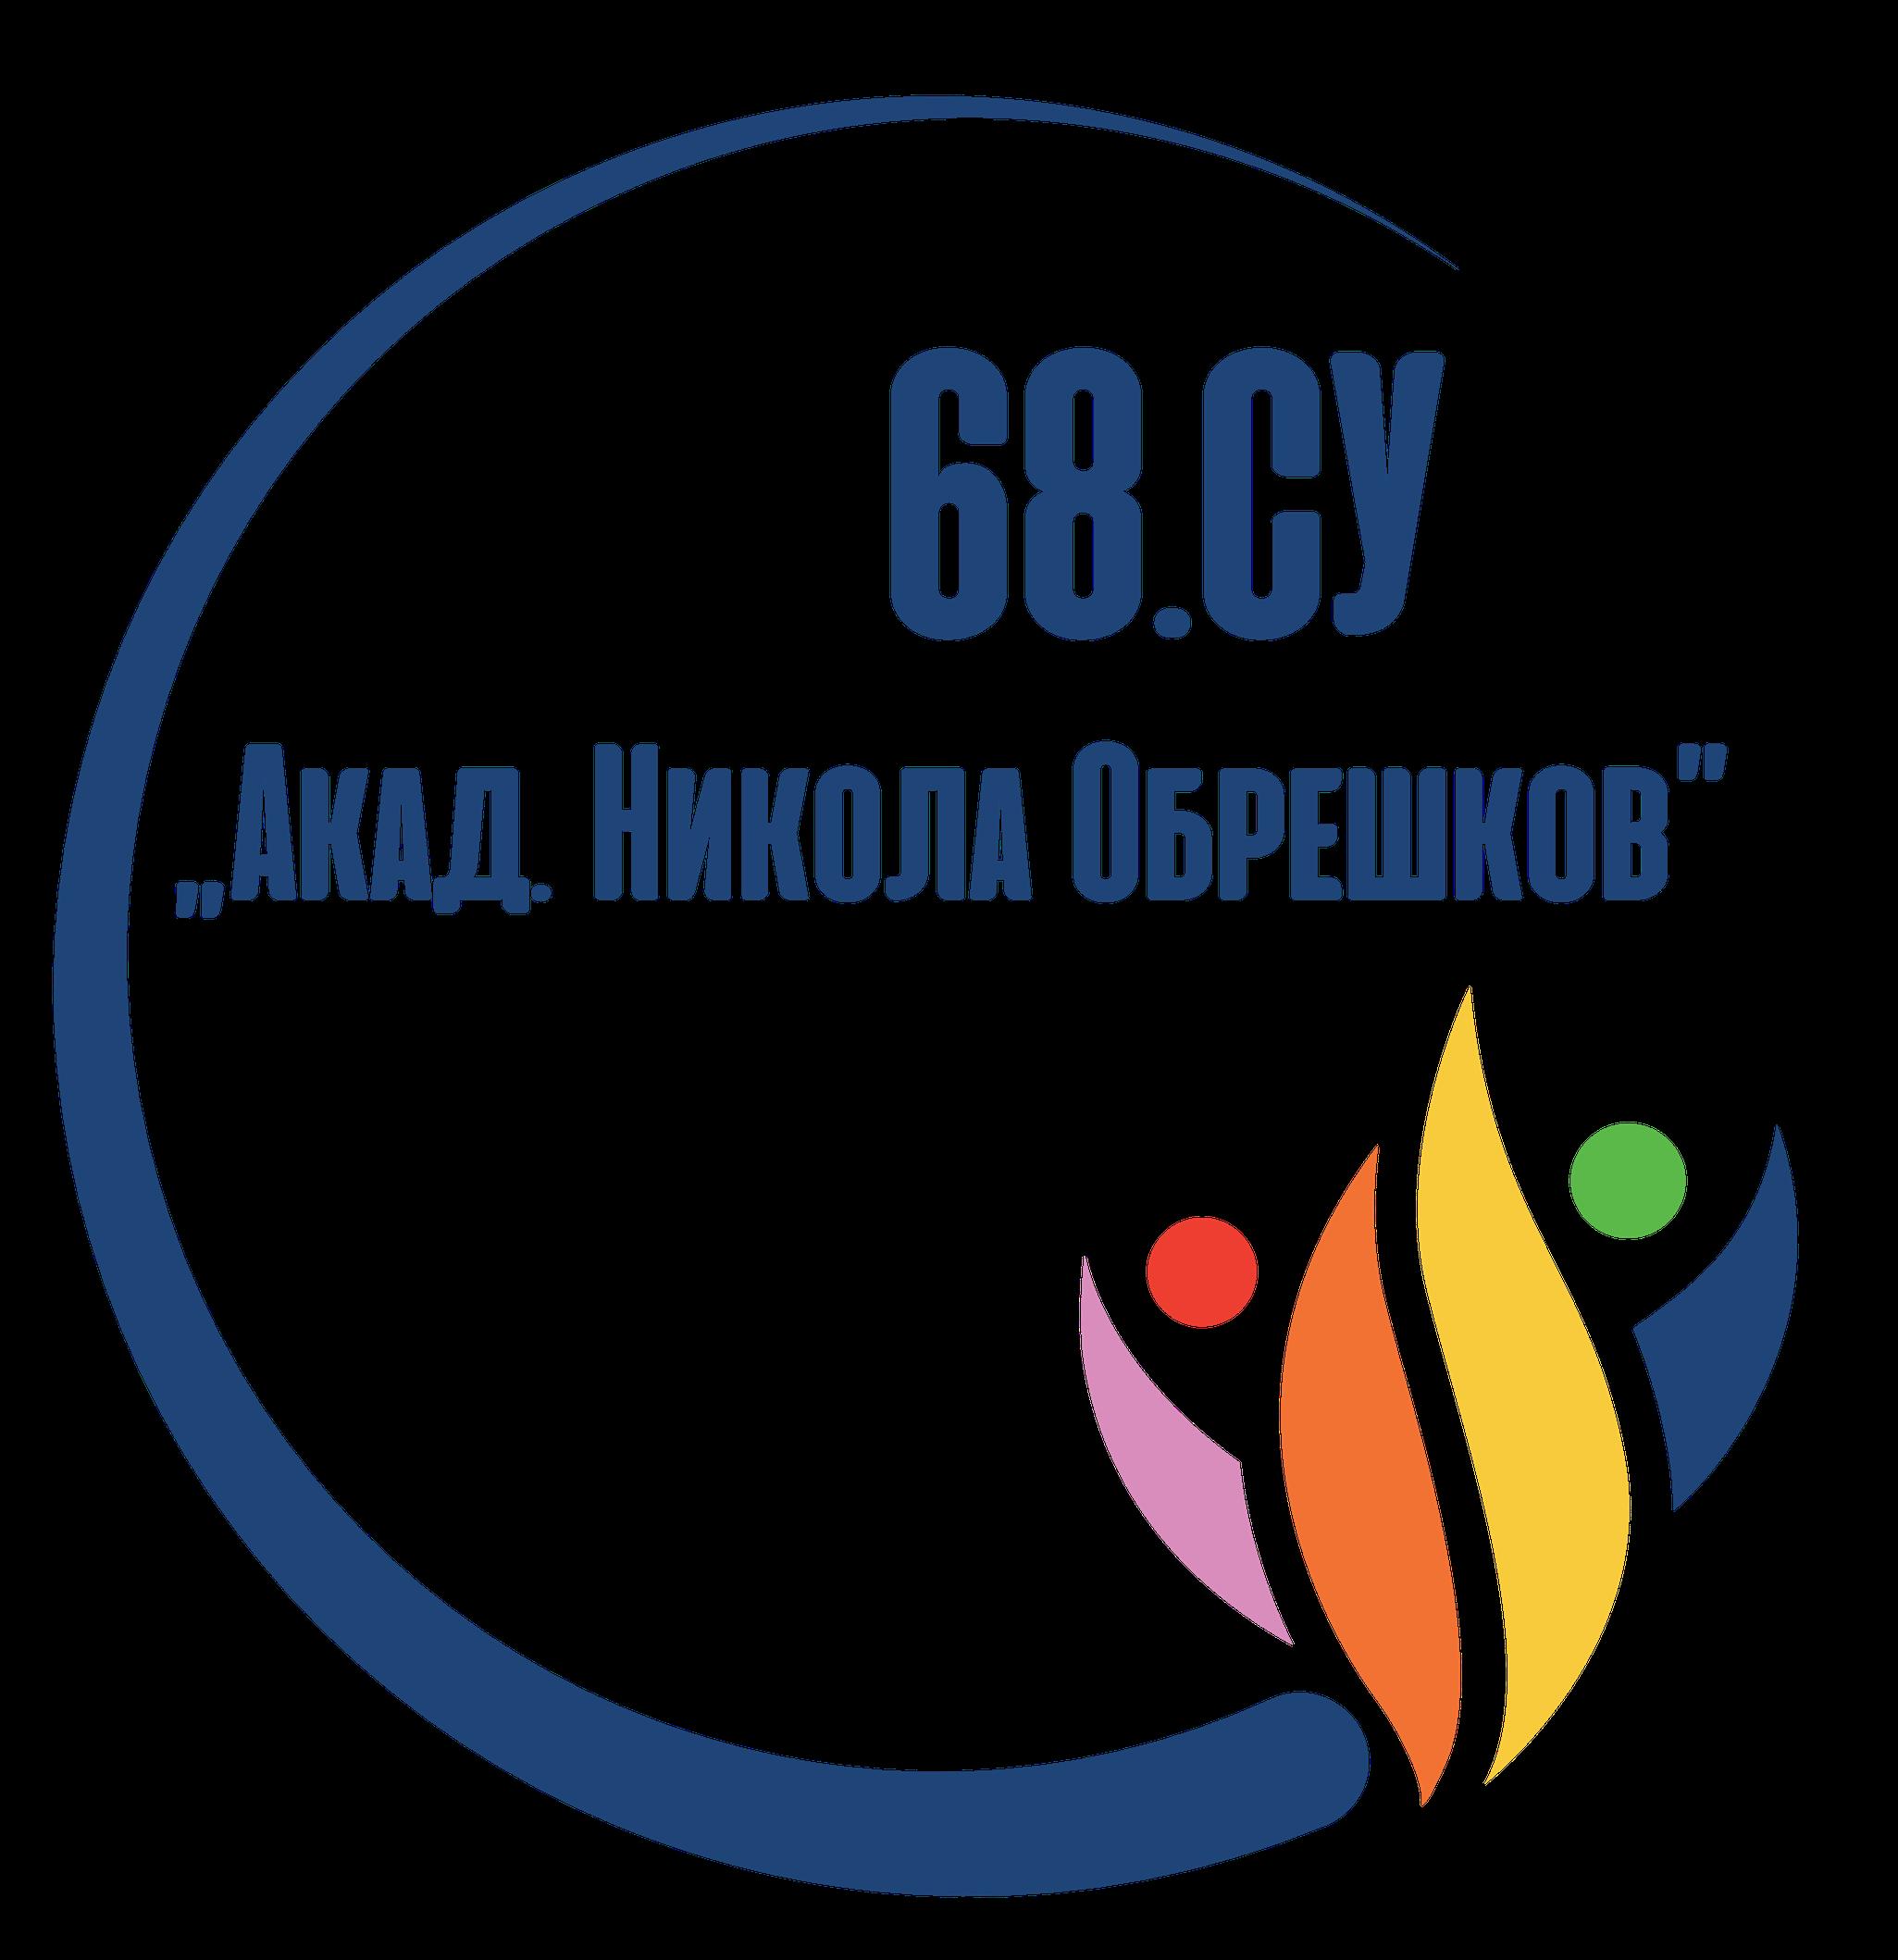 logo68.SU-transperant copy